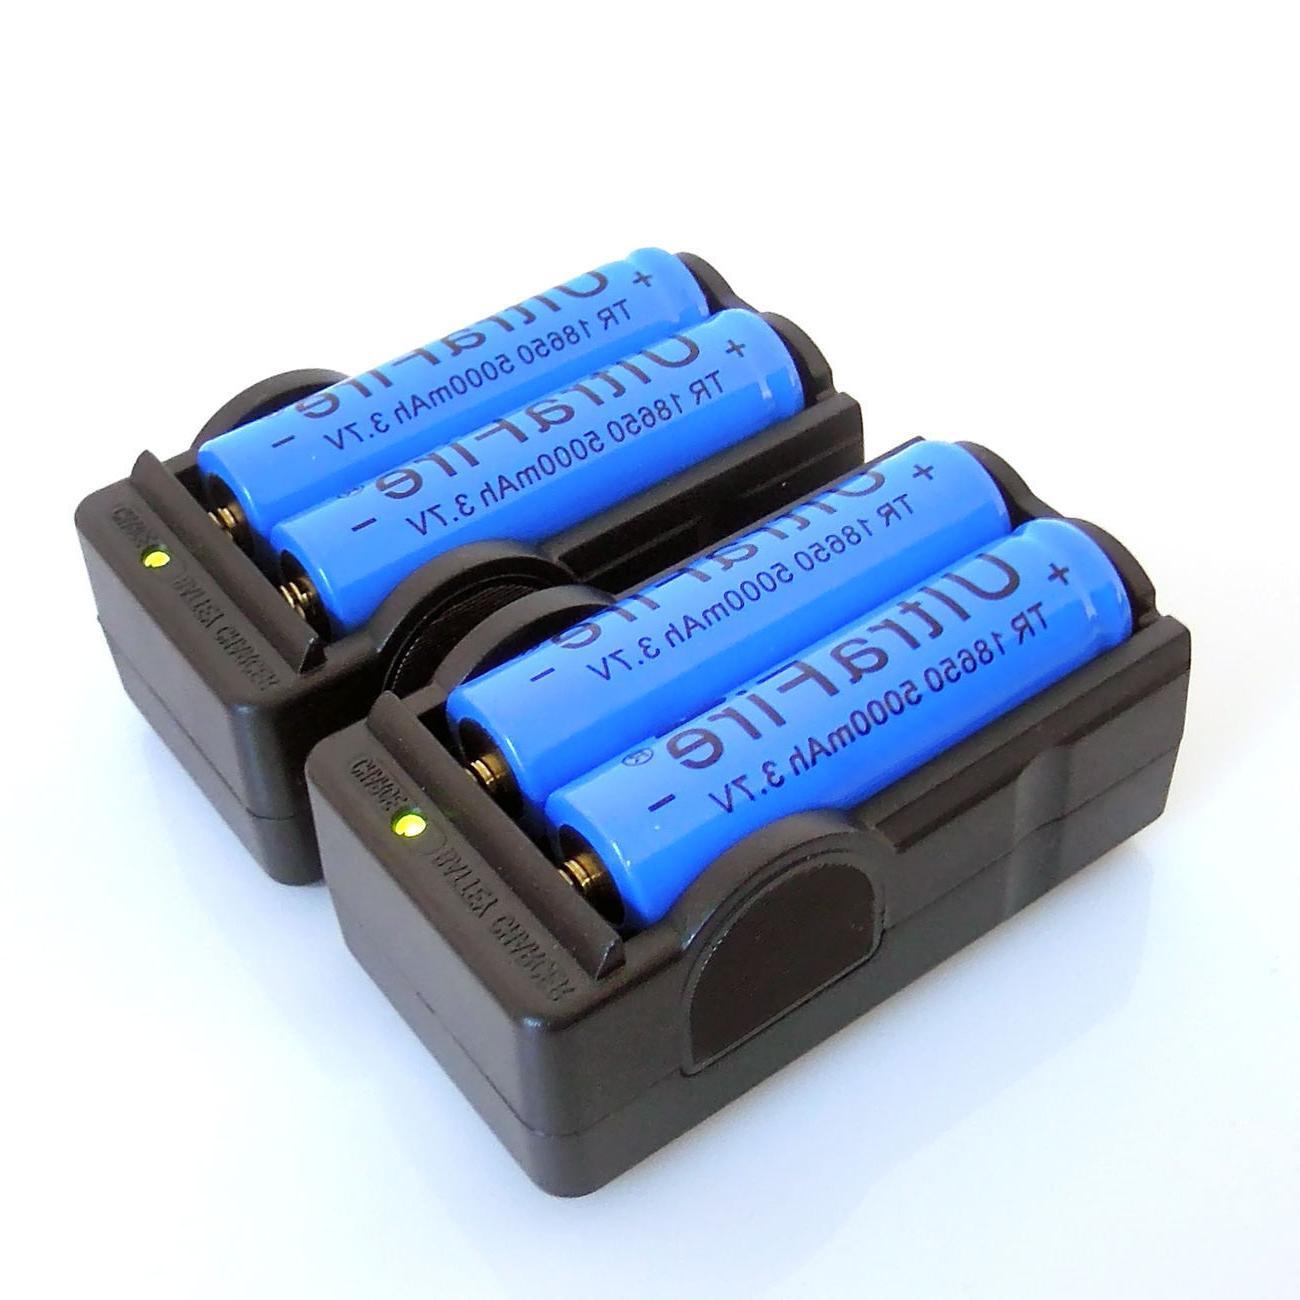 5000mAh 3.7V Li-ion Cell Bat Charger